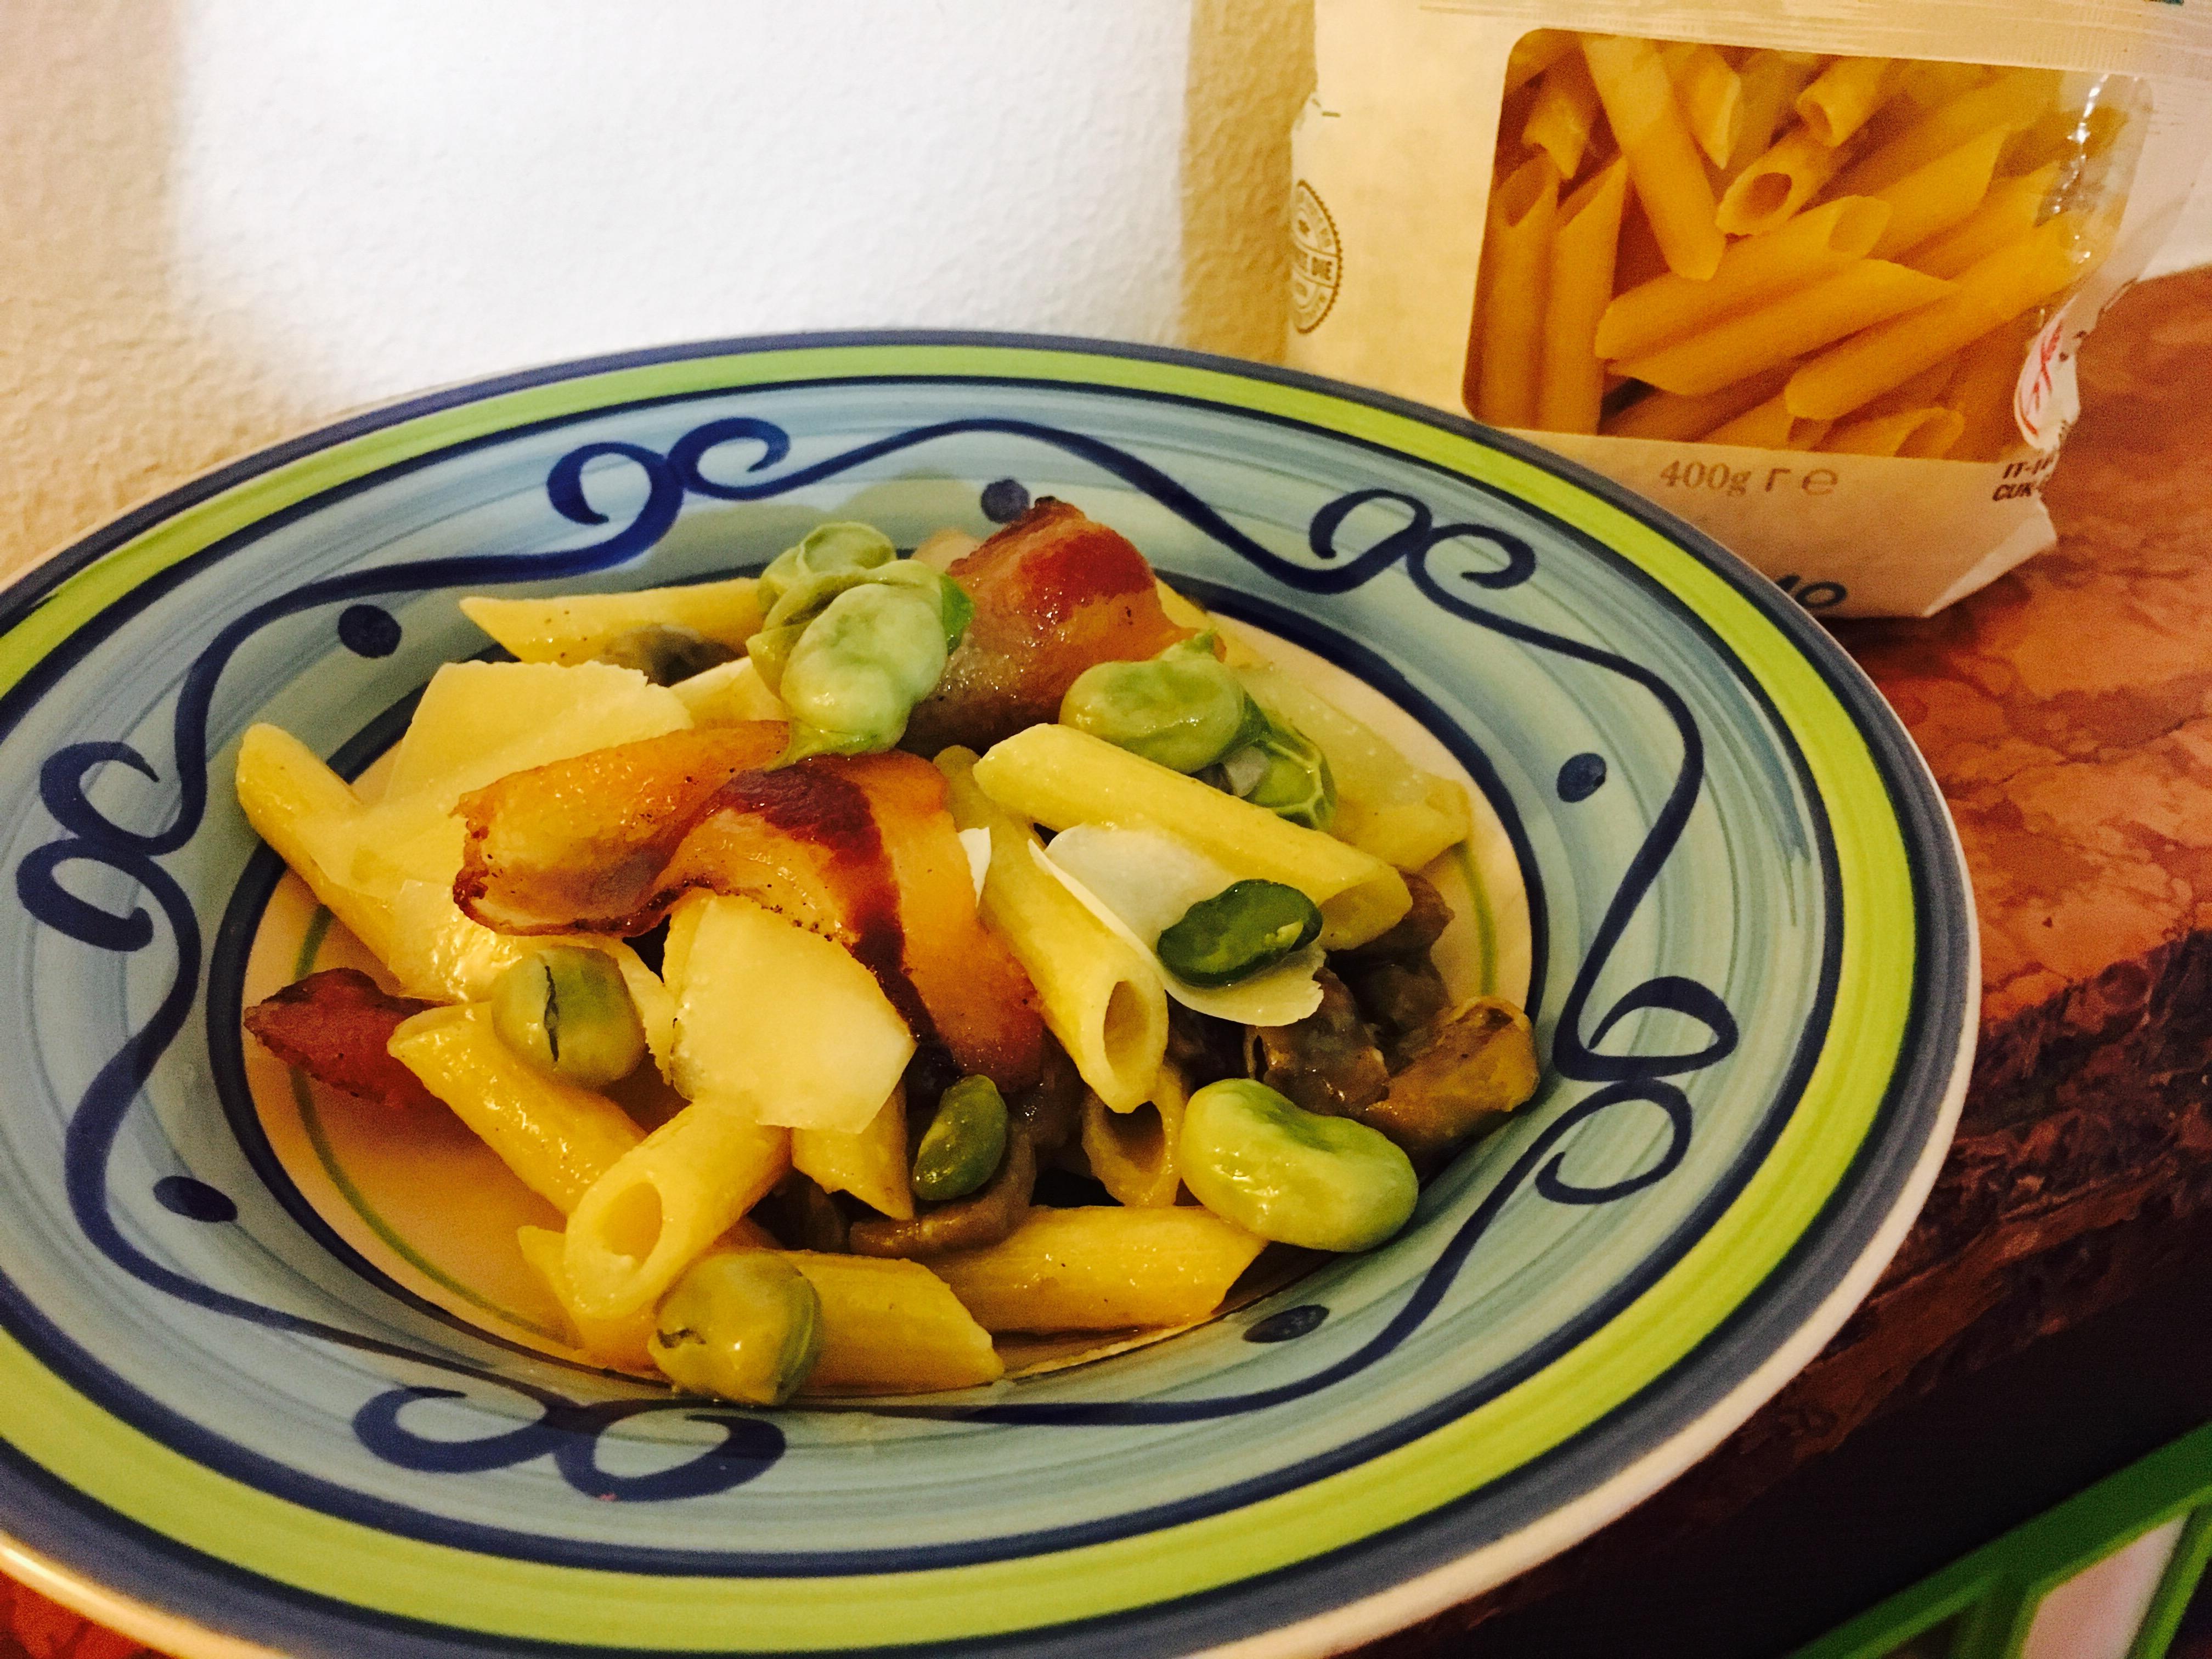 Pasta Rummo senza glutine -Gluten free Travel and Living